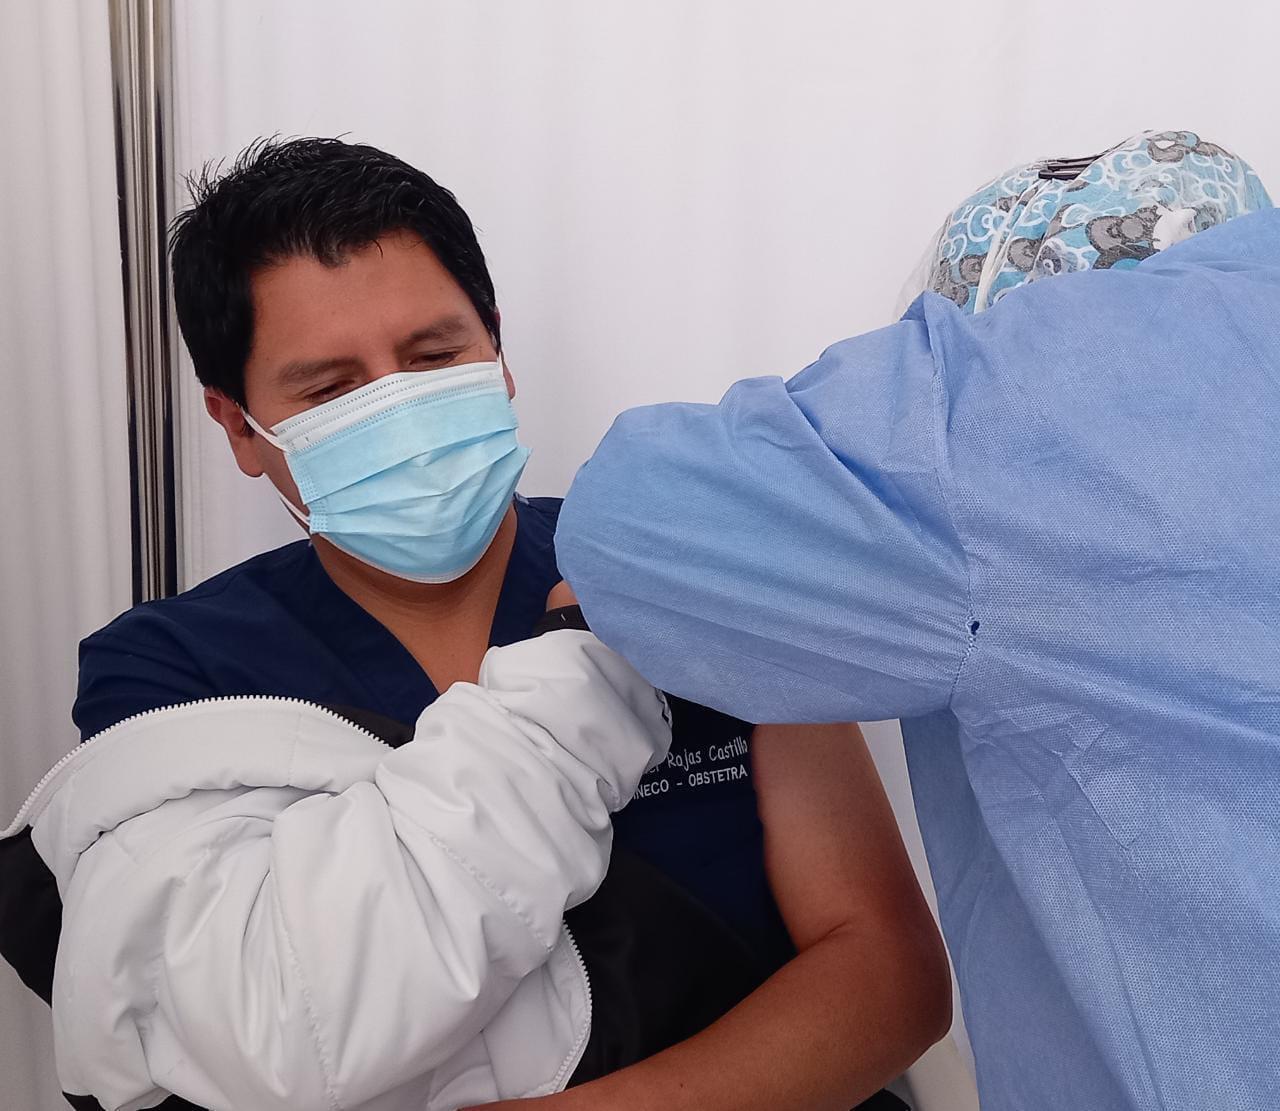 Essalud - EsSalud Huancavelica aplica tercera dosis de vacuna contra Covid-19